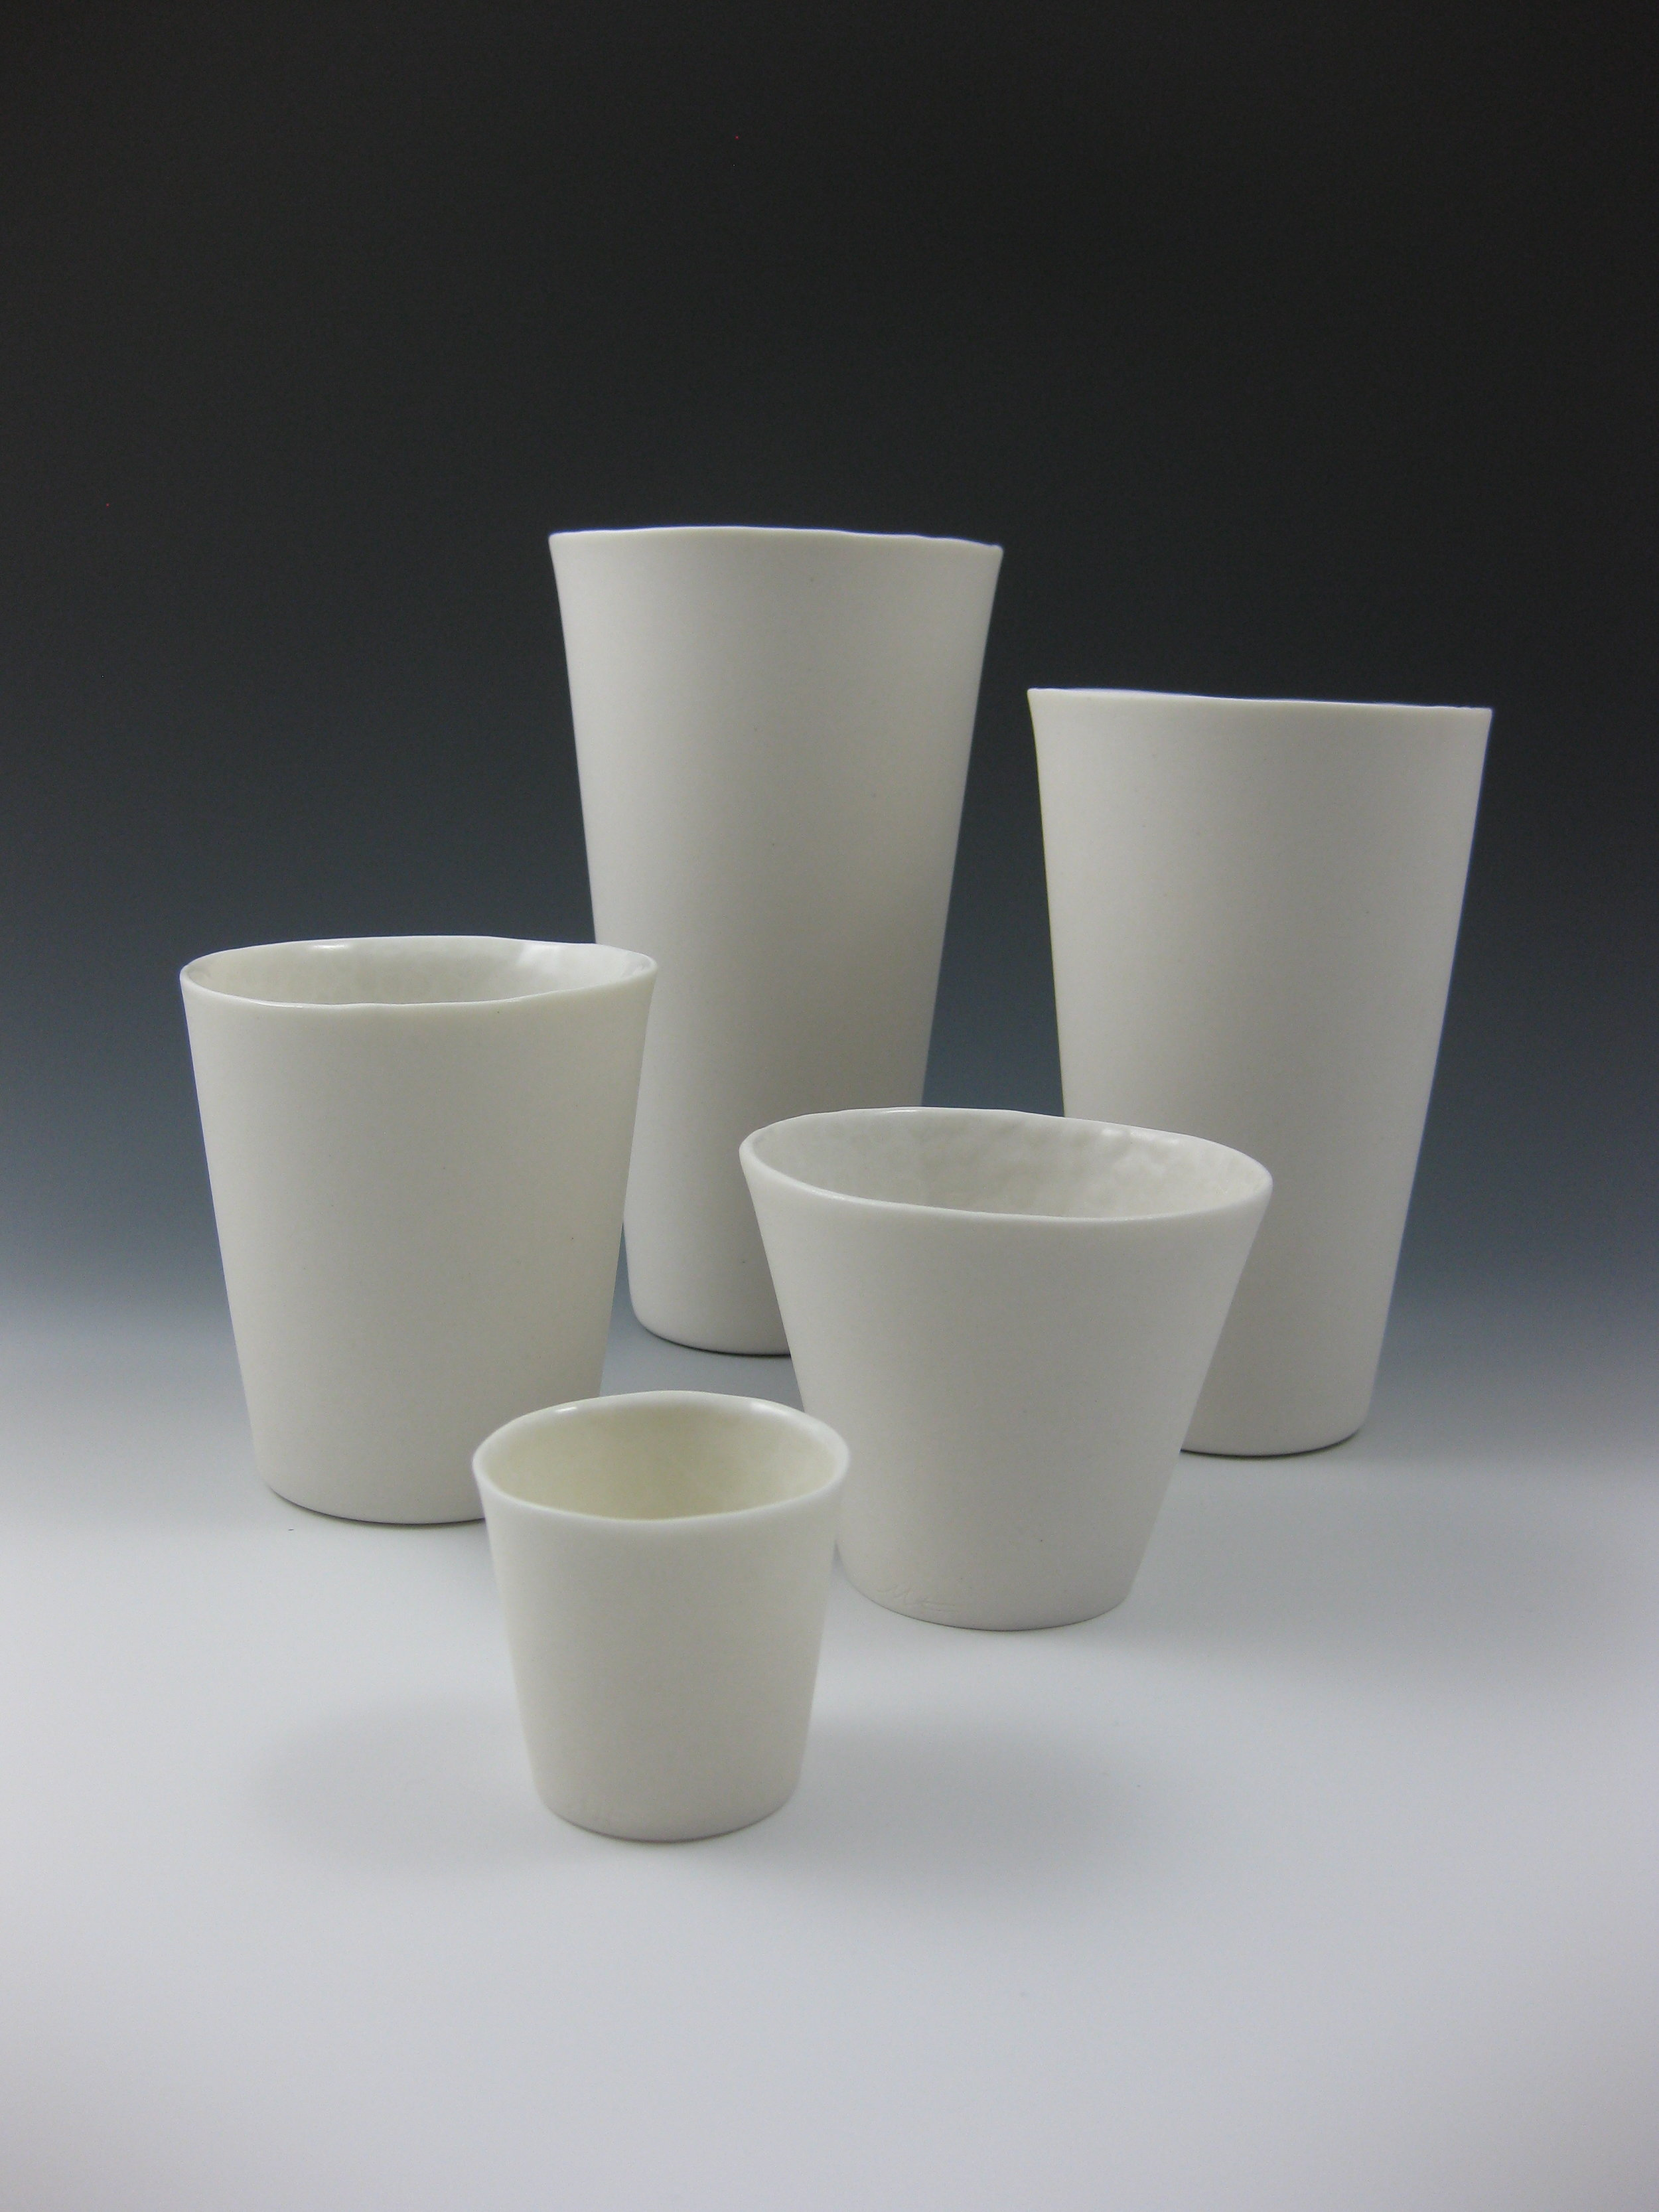 tobia:pots at rest image.JPG